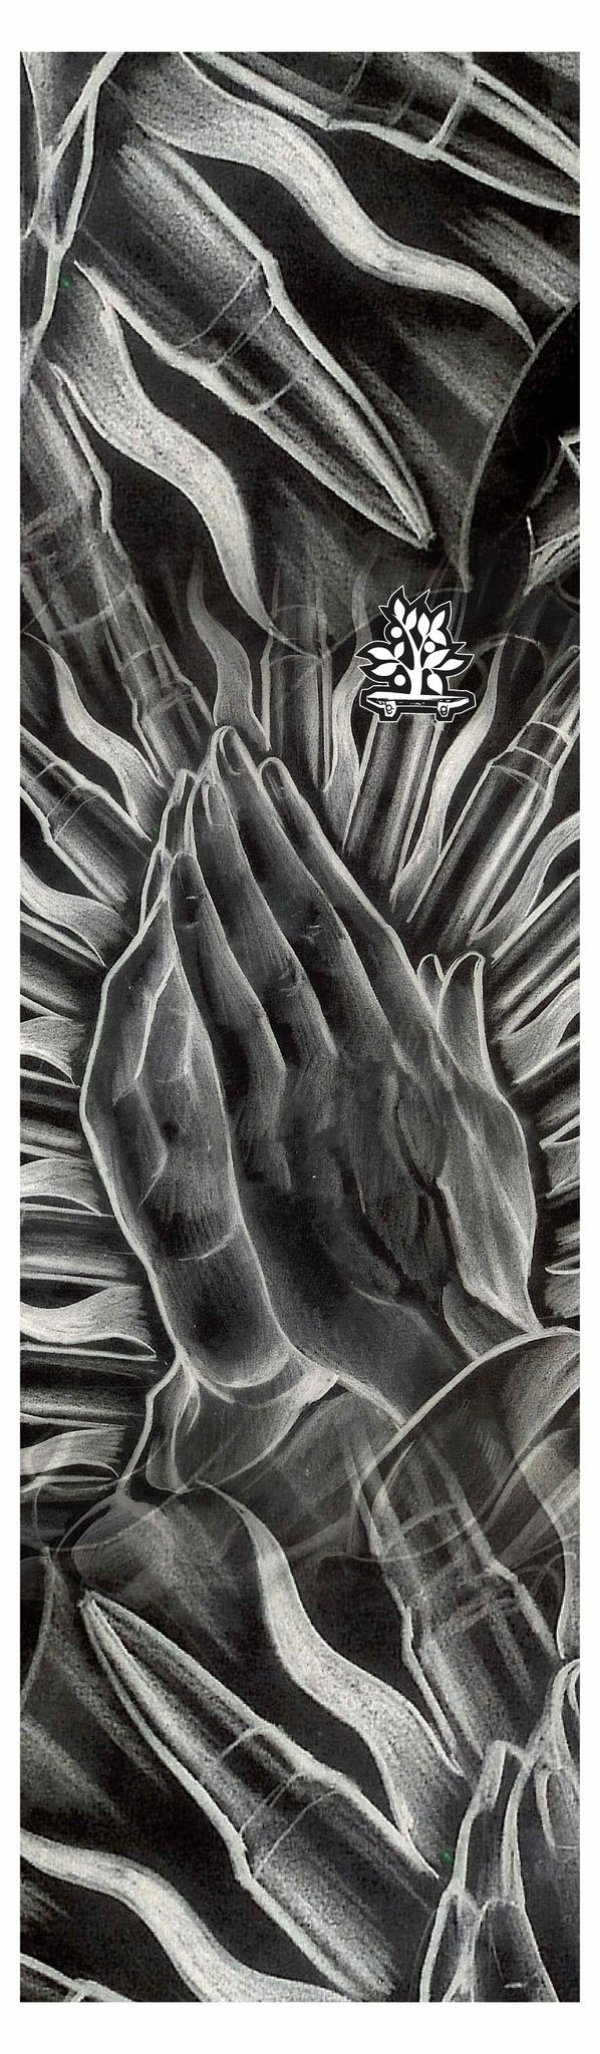 Lixa Emborrachada Wood Light Pray Hands